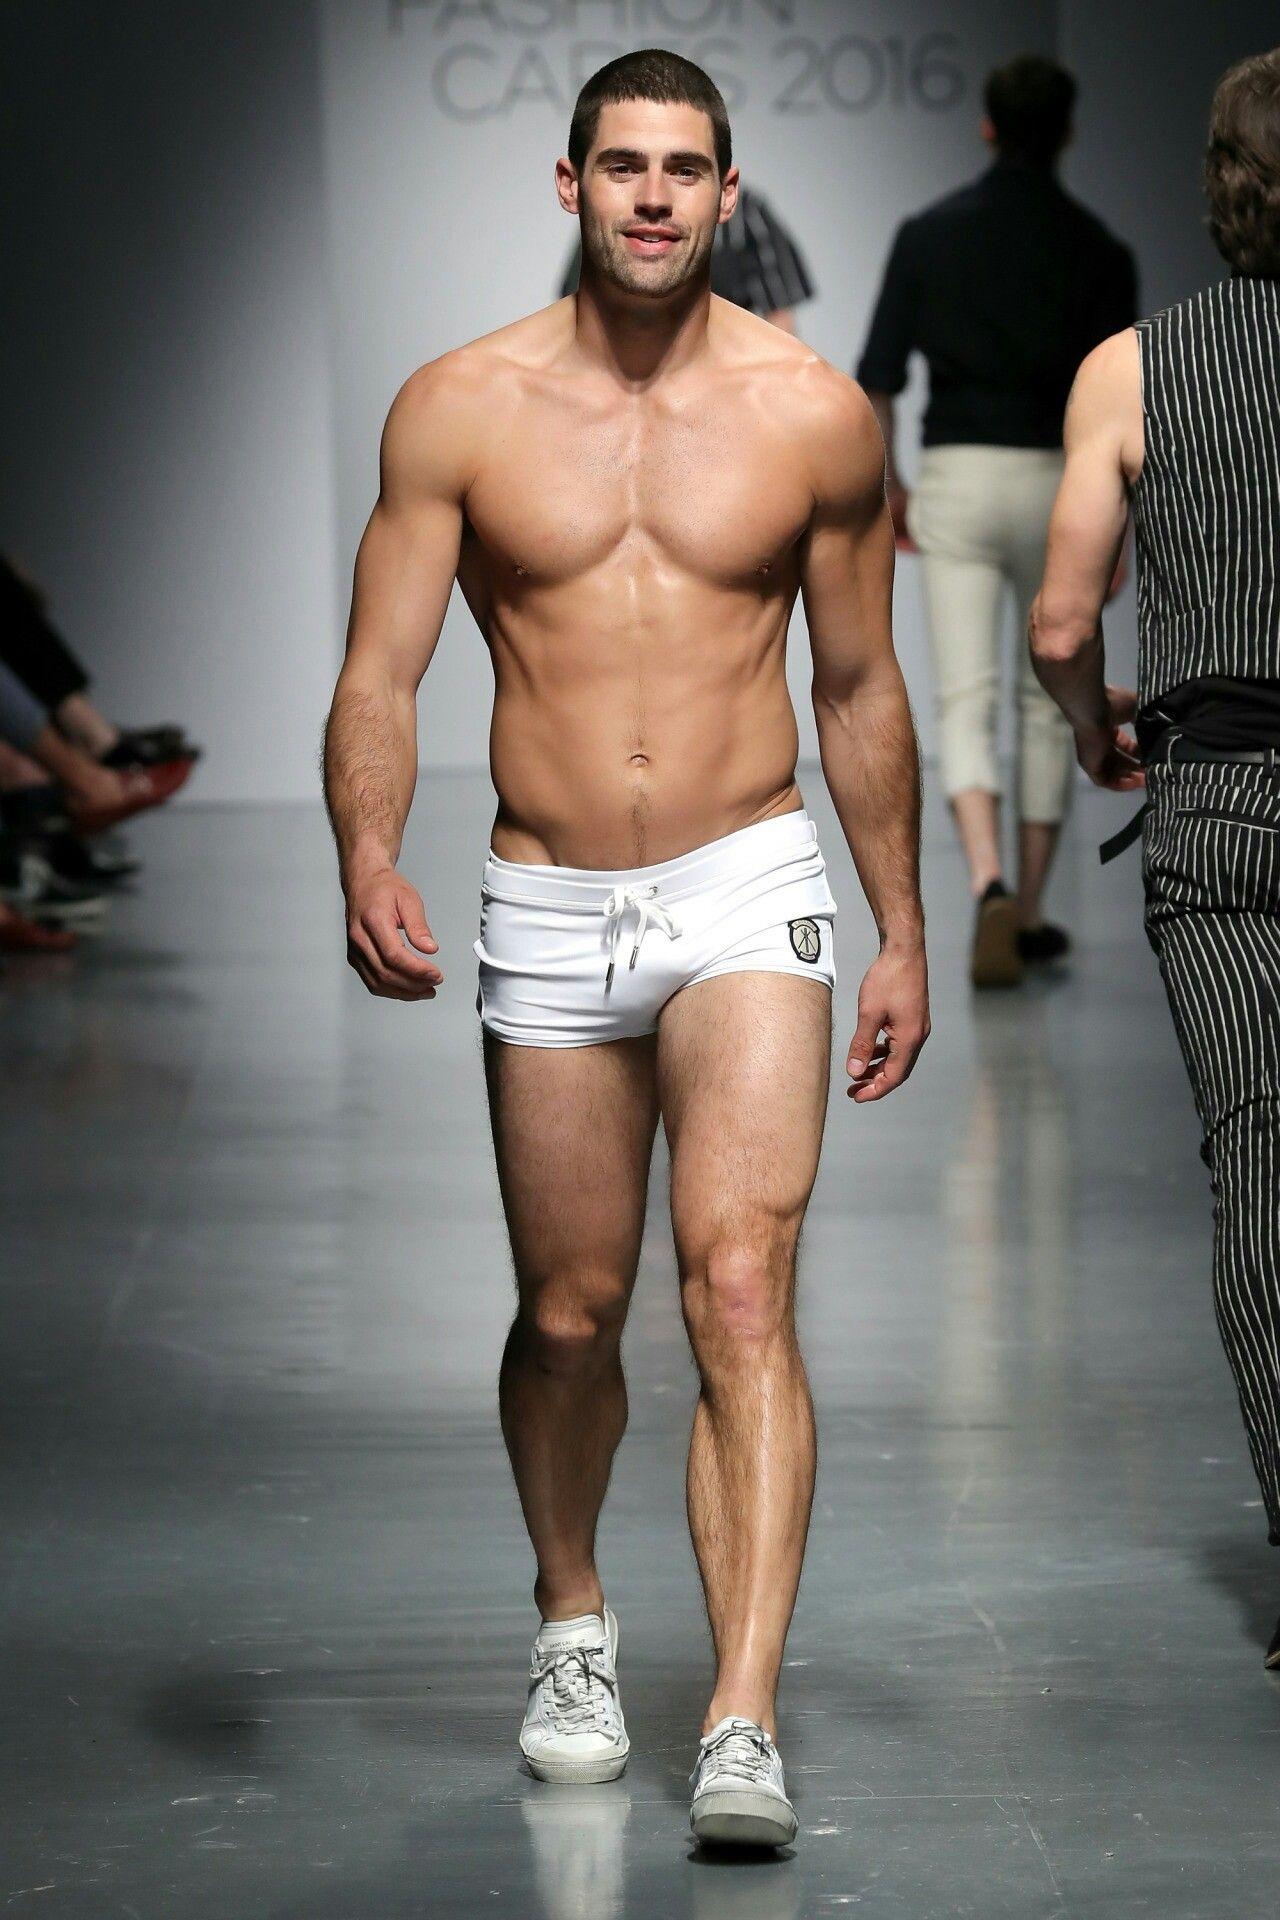 Men's underwear/swimwear Runway Show, Chad White ...